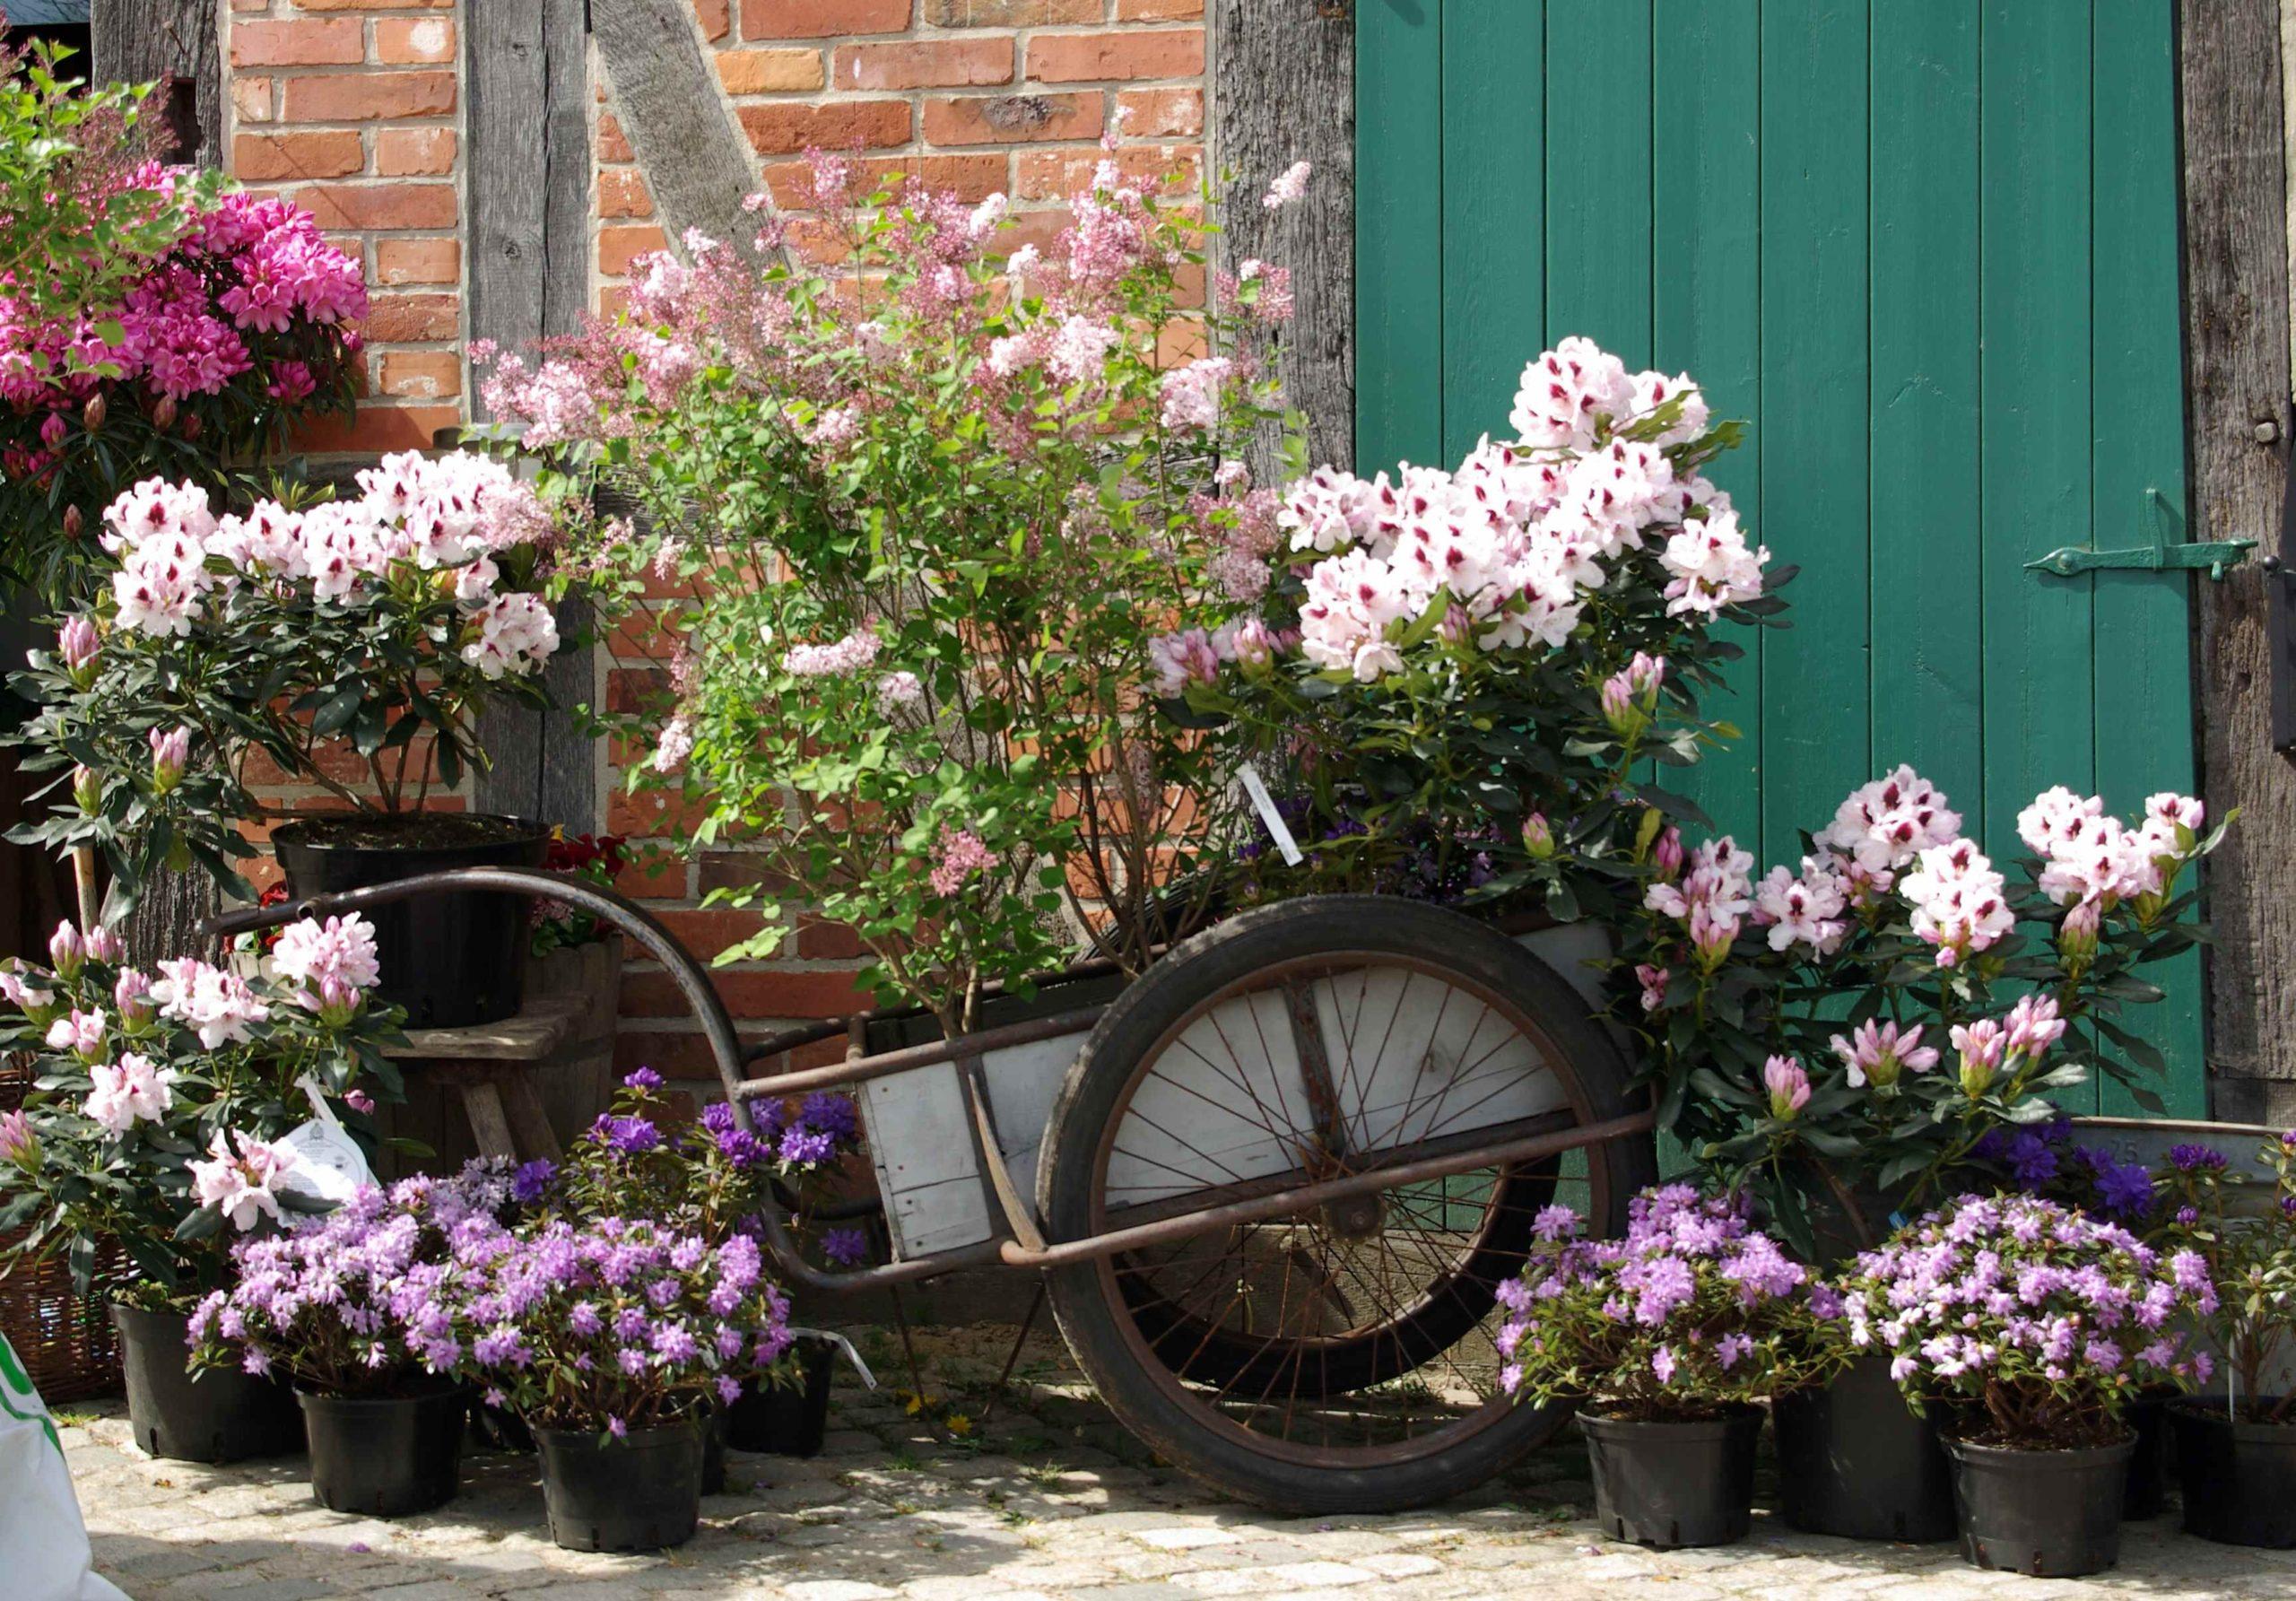 Rosen - Pflanzenmarkt - Spezial 2020 im Sommer 29.+30.8.20 - Bild FLMK (5) (002)